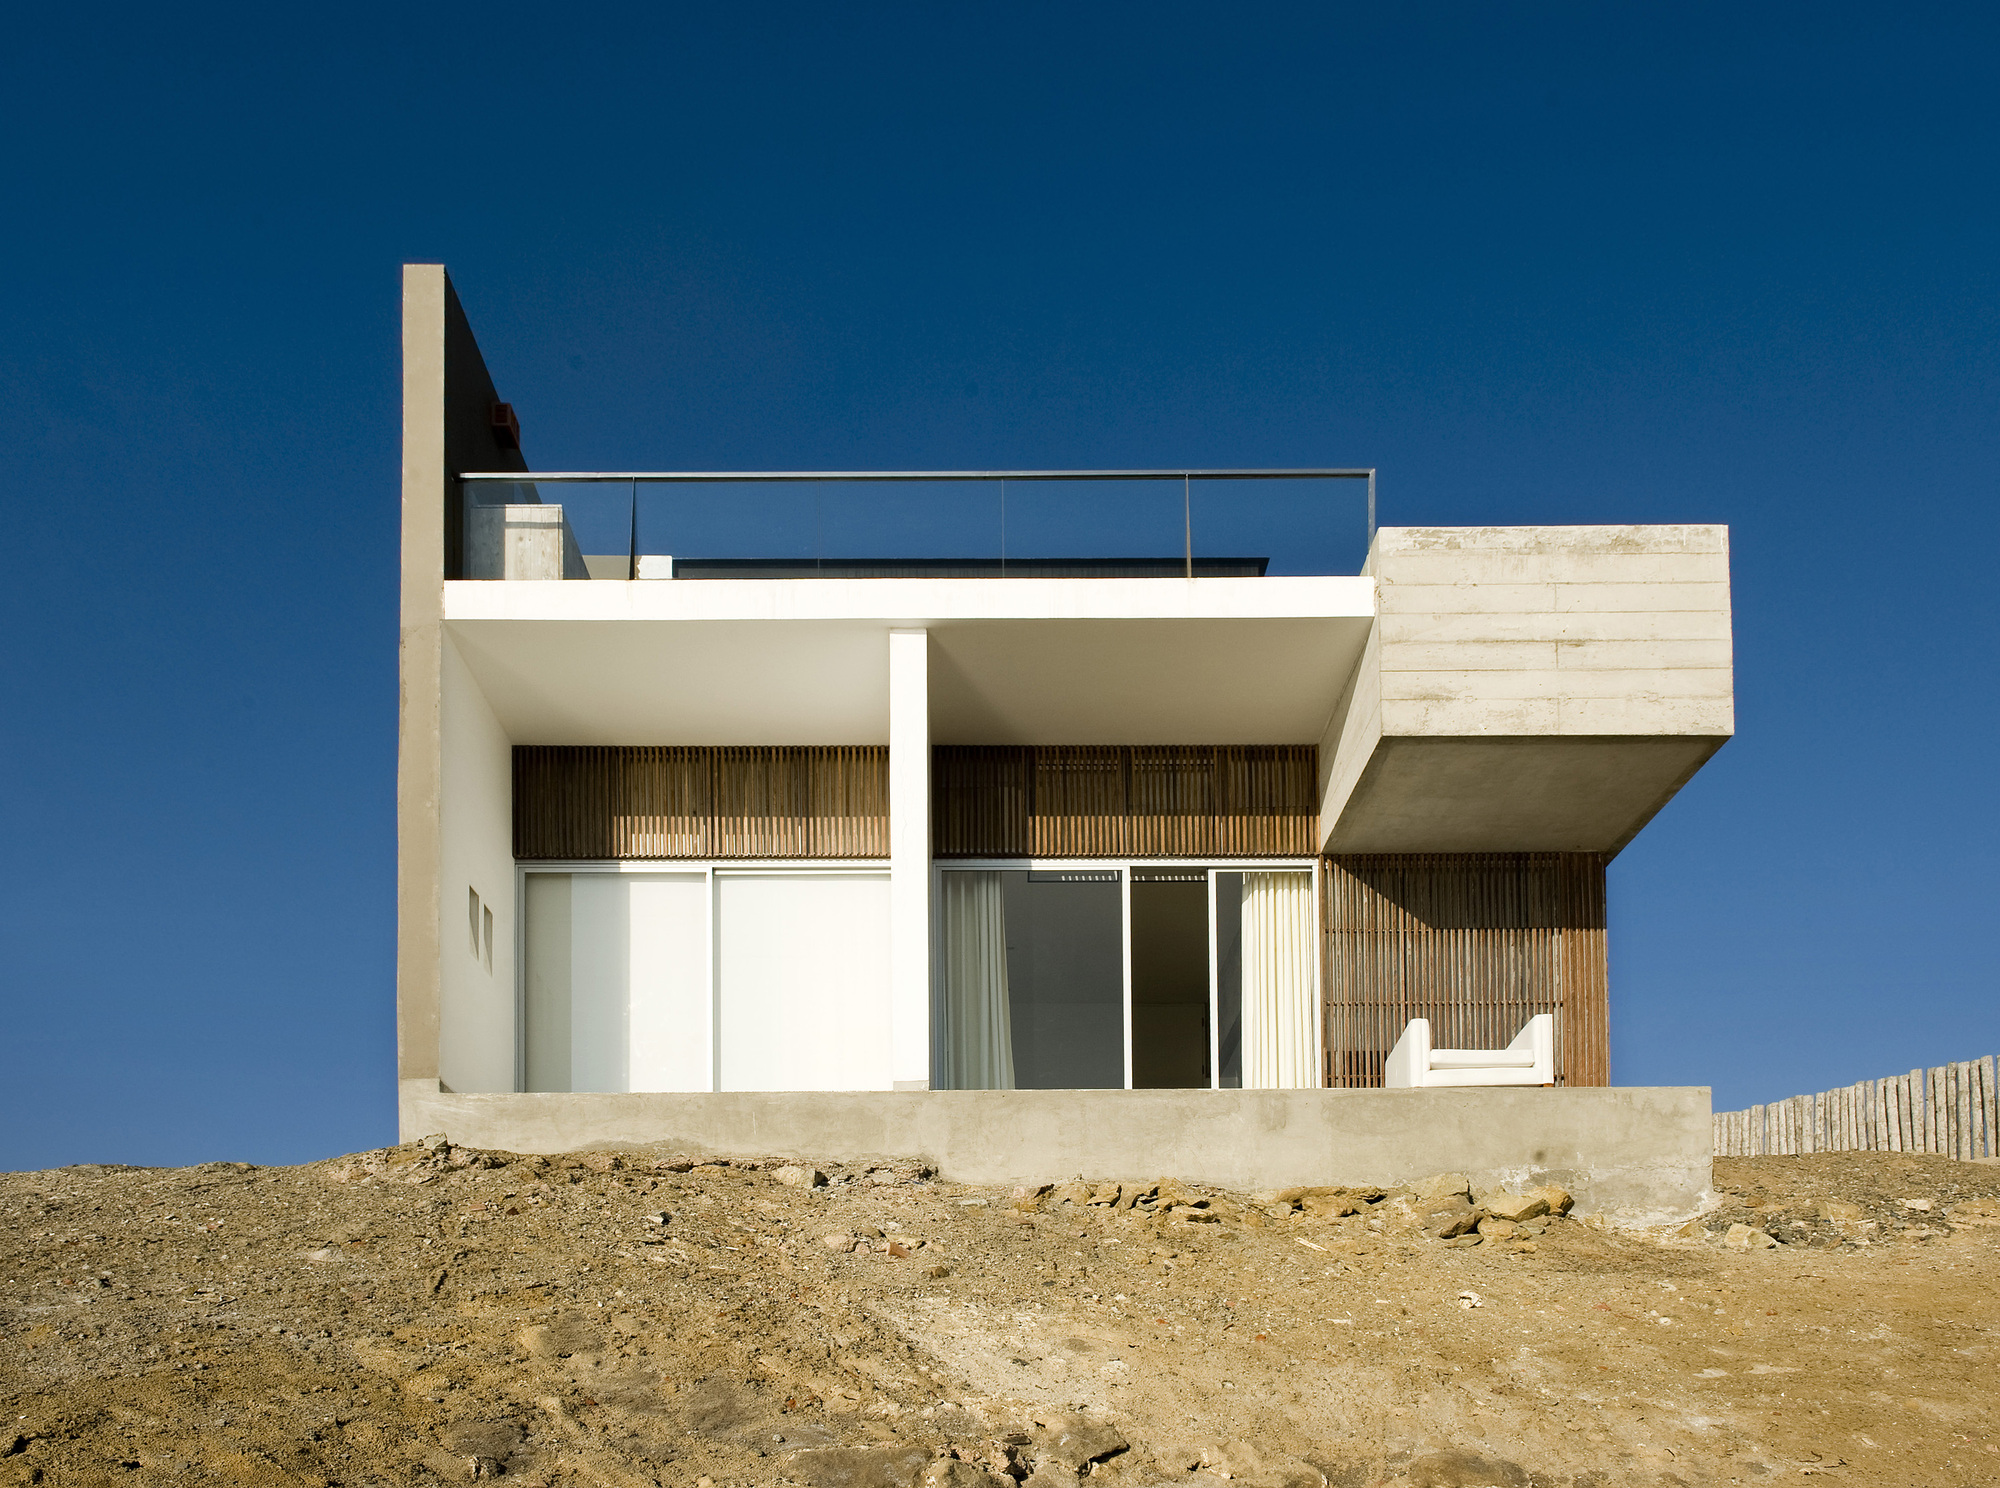 Beach house jordi puig archdaily for Parrillas para casa de playa